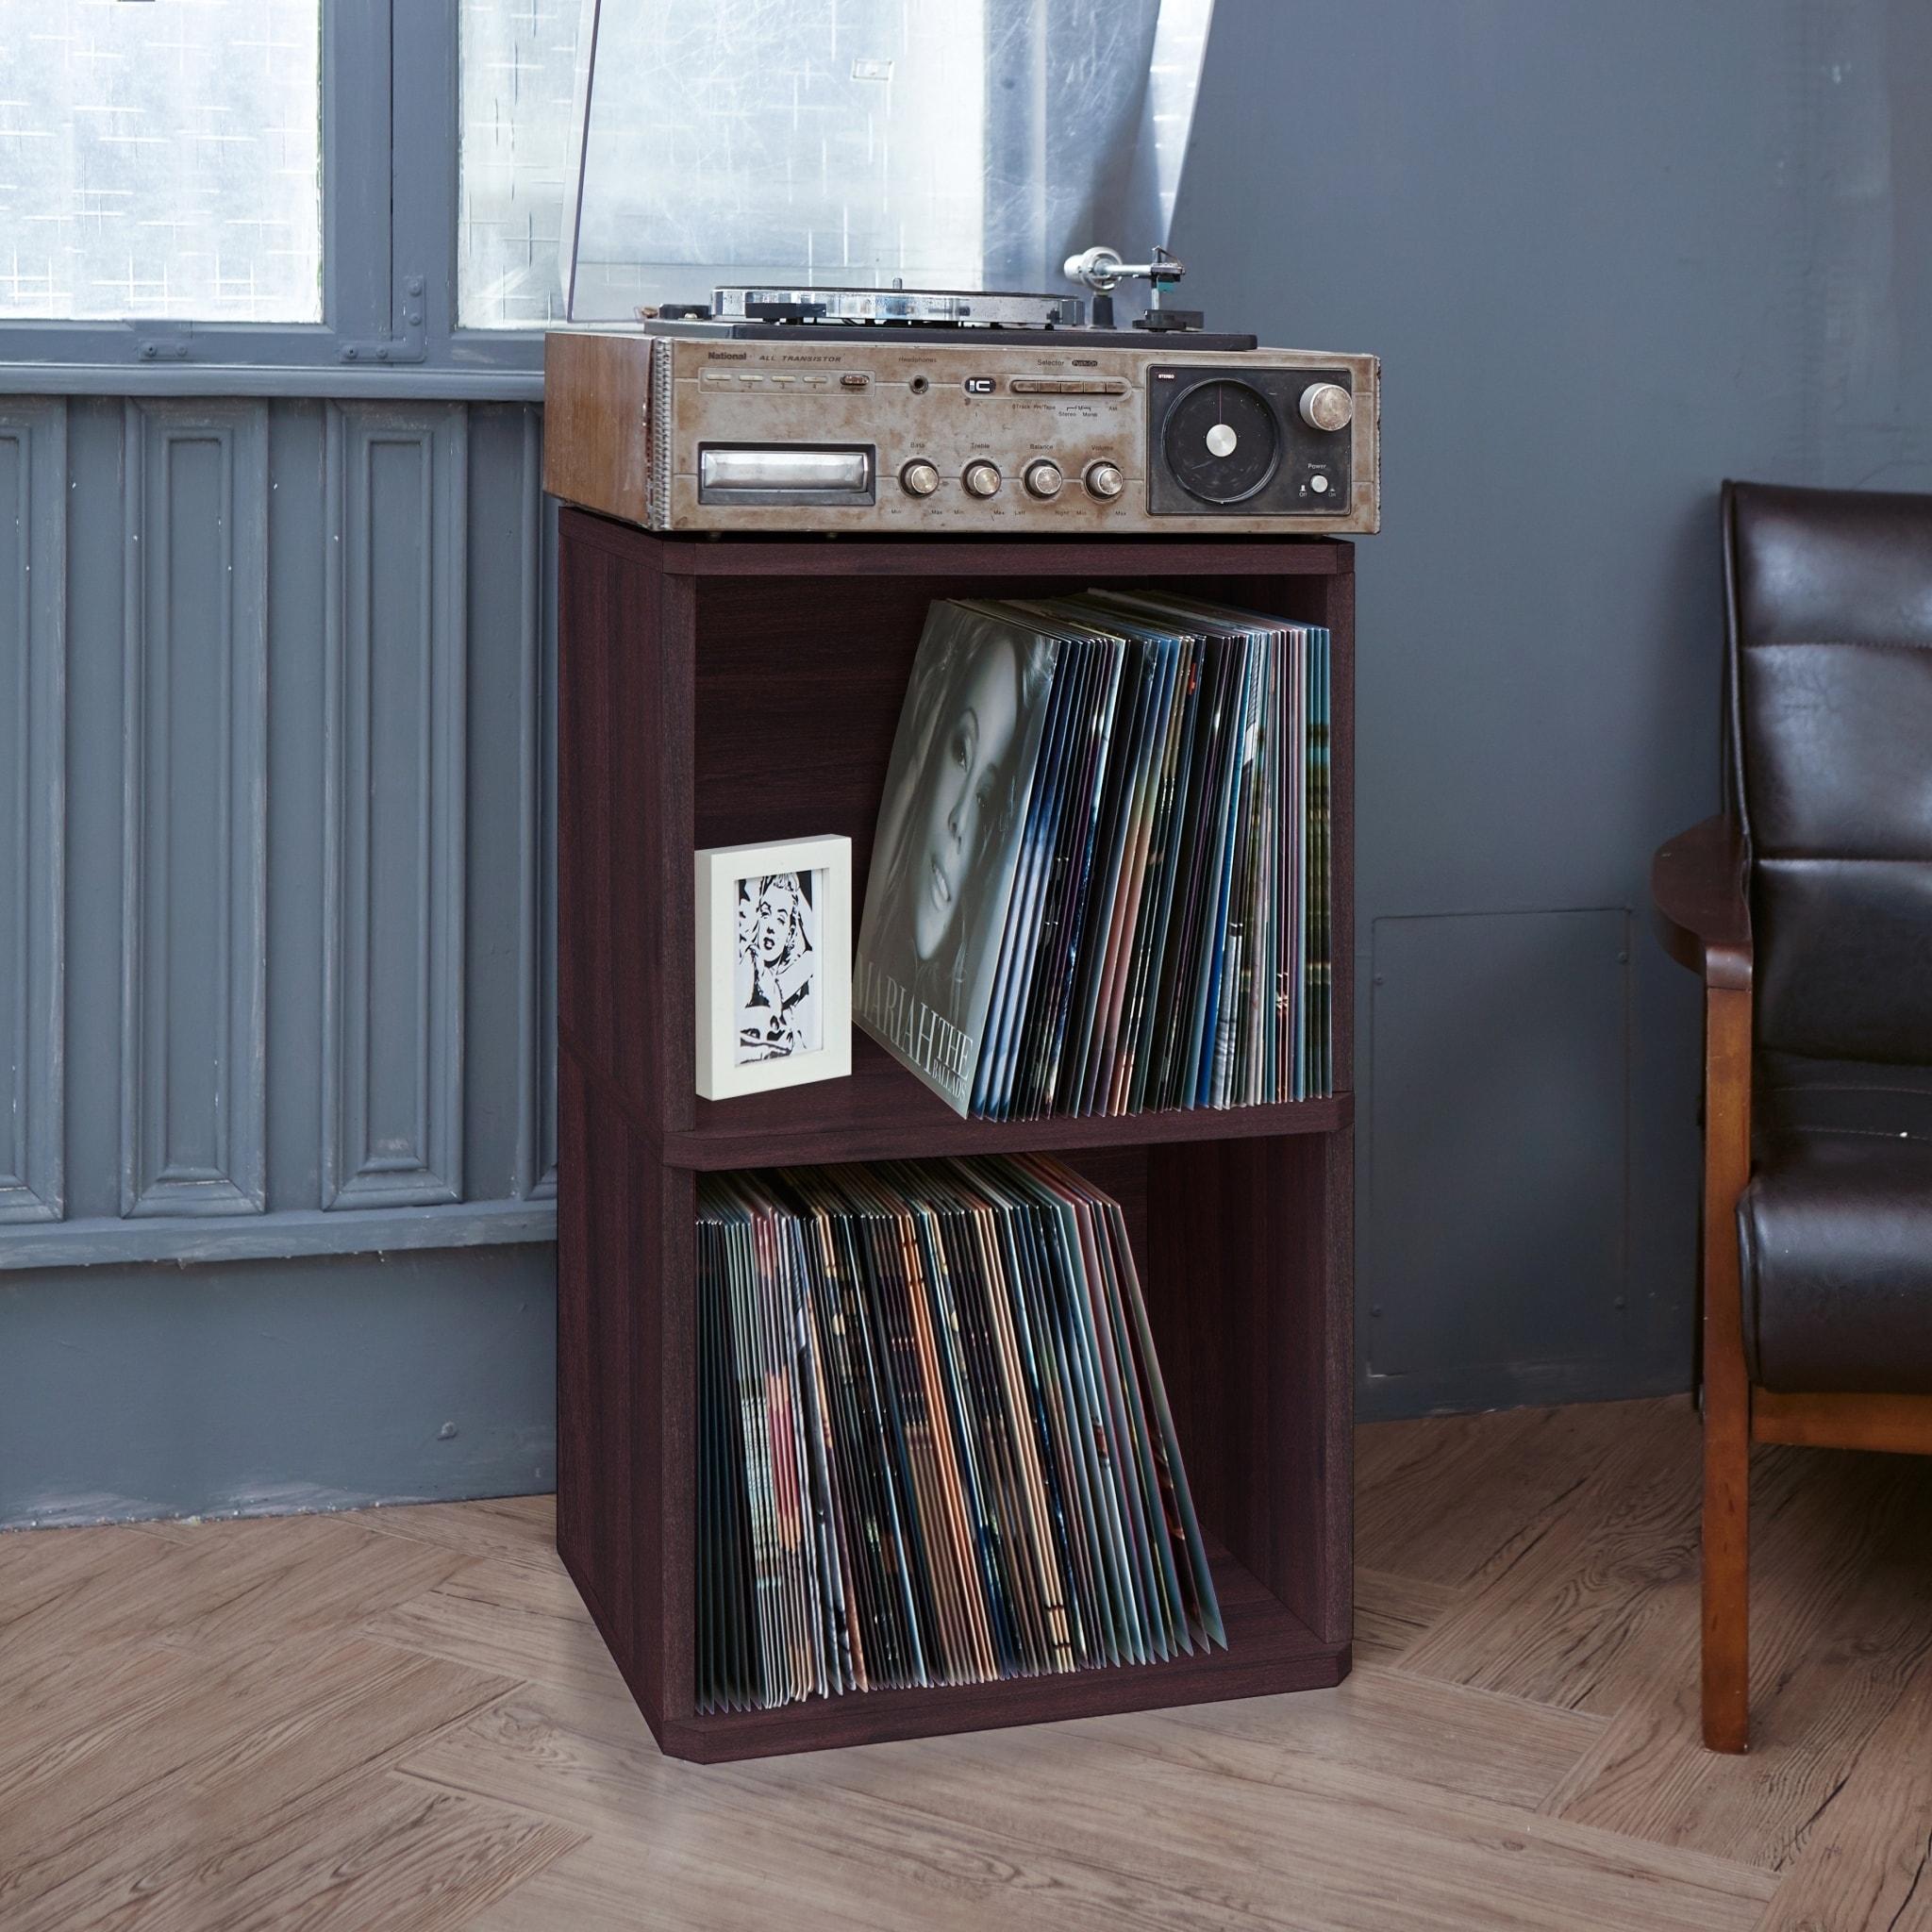 Latest Collection Of Eco 2-shelf Vinyl Lp Record Album Storage Cube Black Lifetime Guarantee Storage & Media Accessories